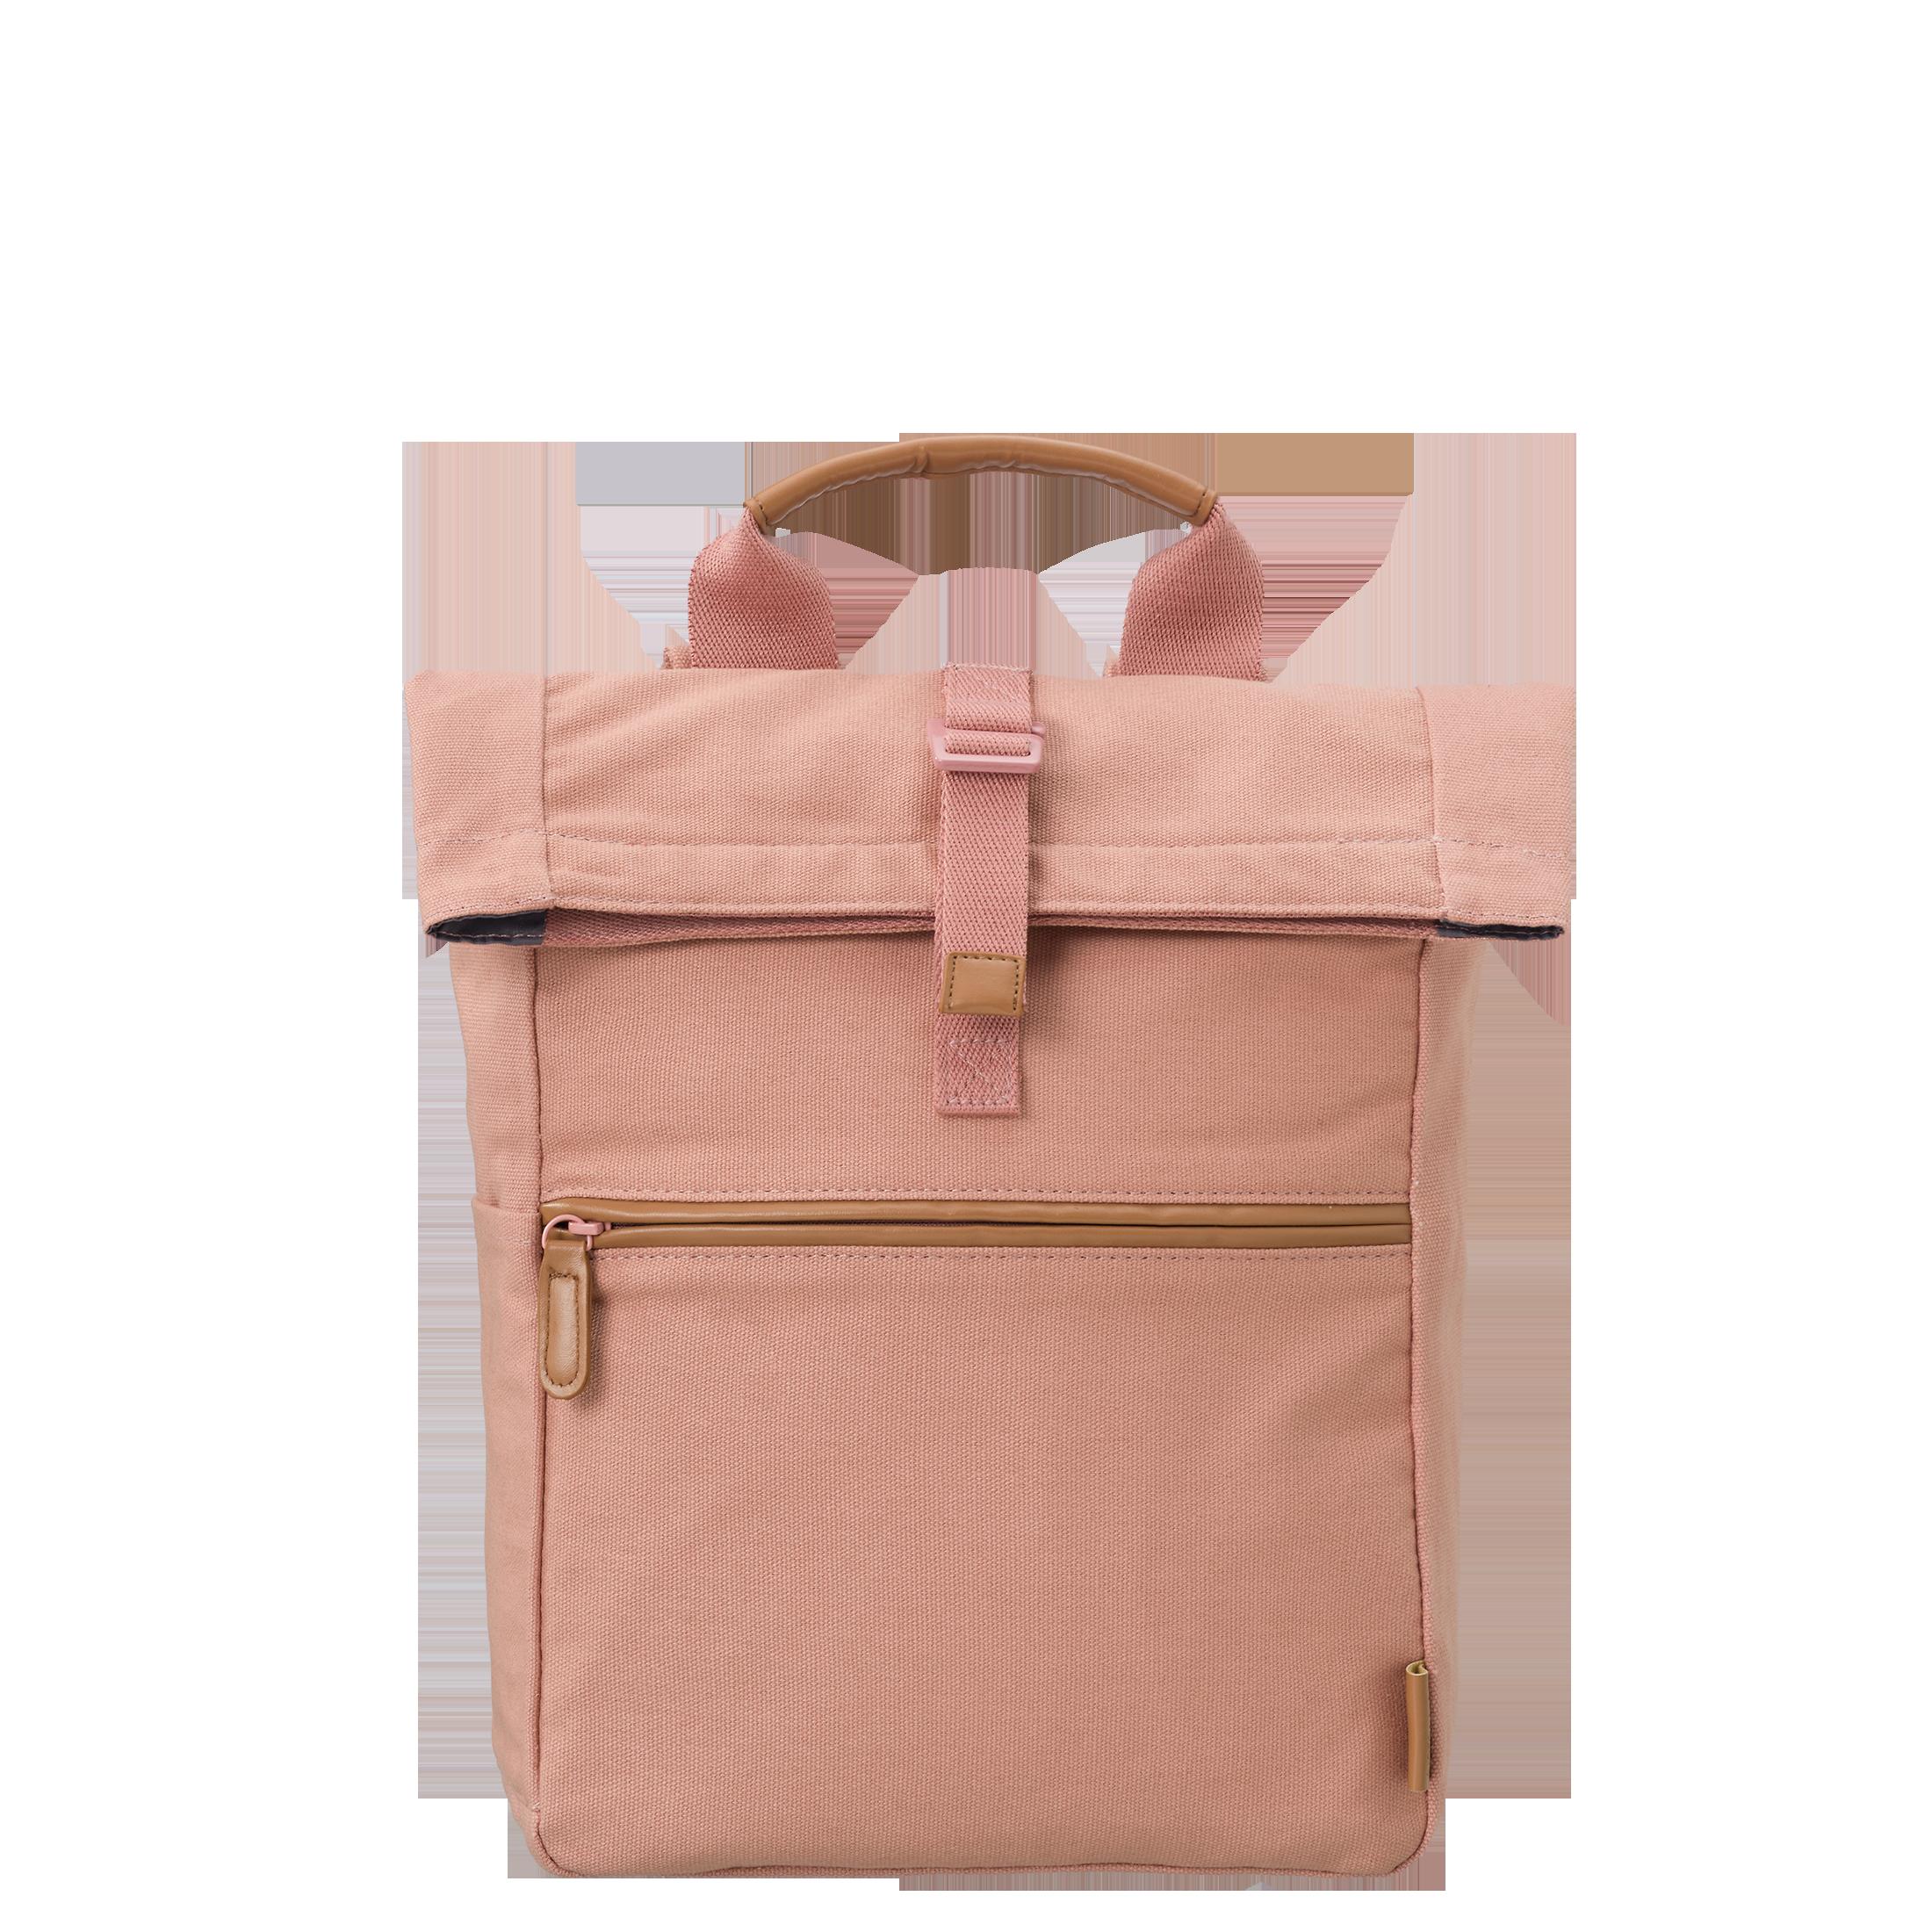 Afbeelding Fresk Backpack Uni Small I Ash Rose